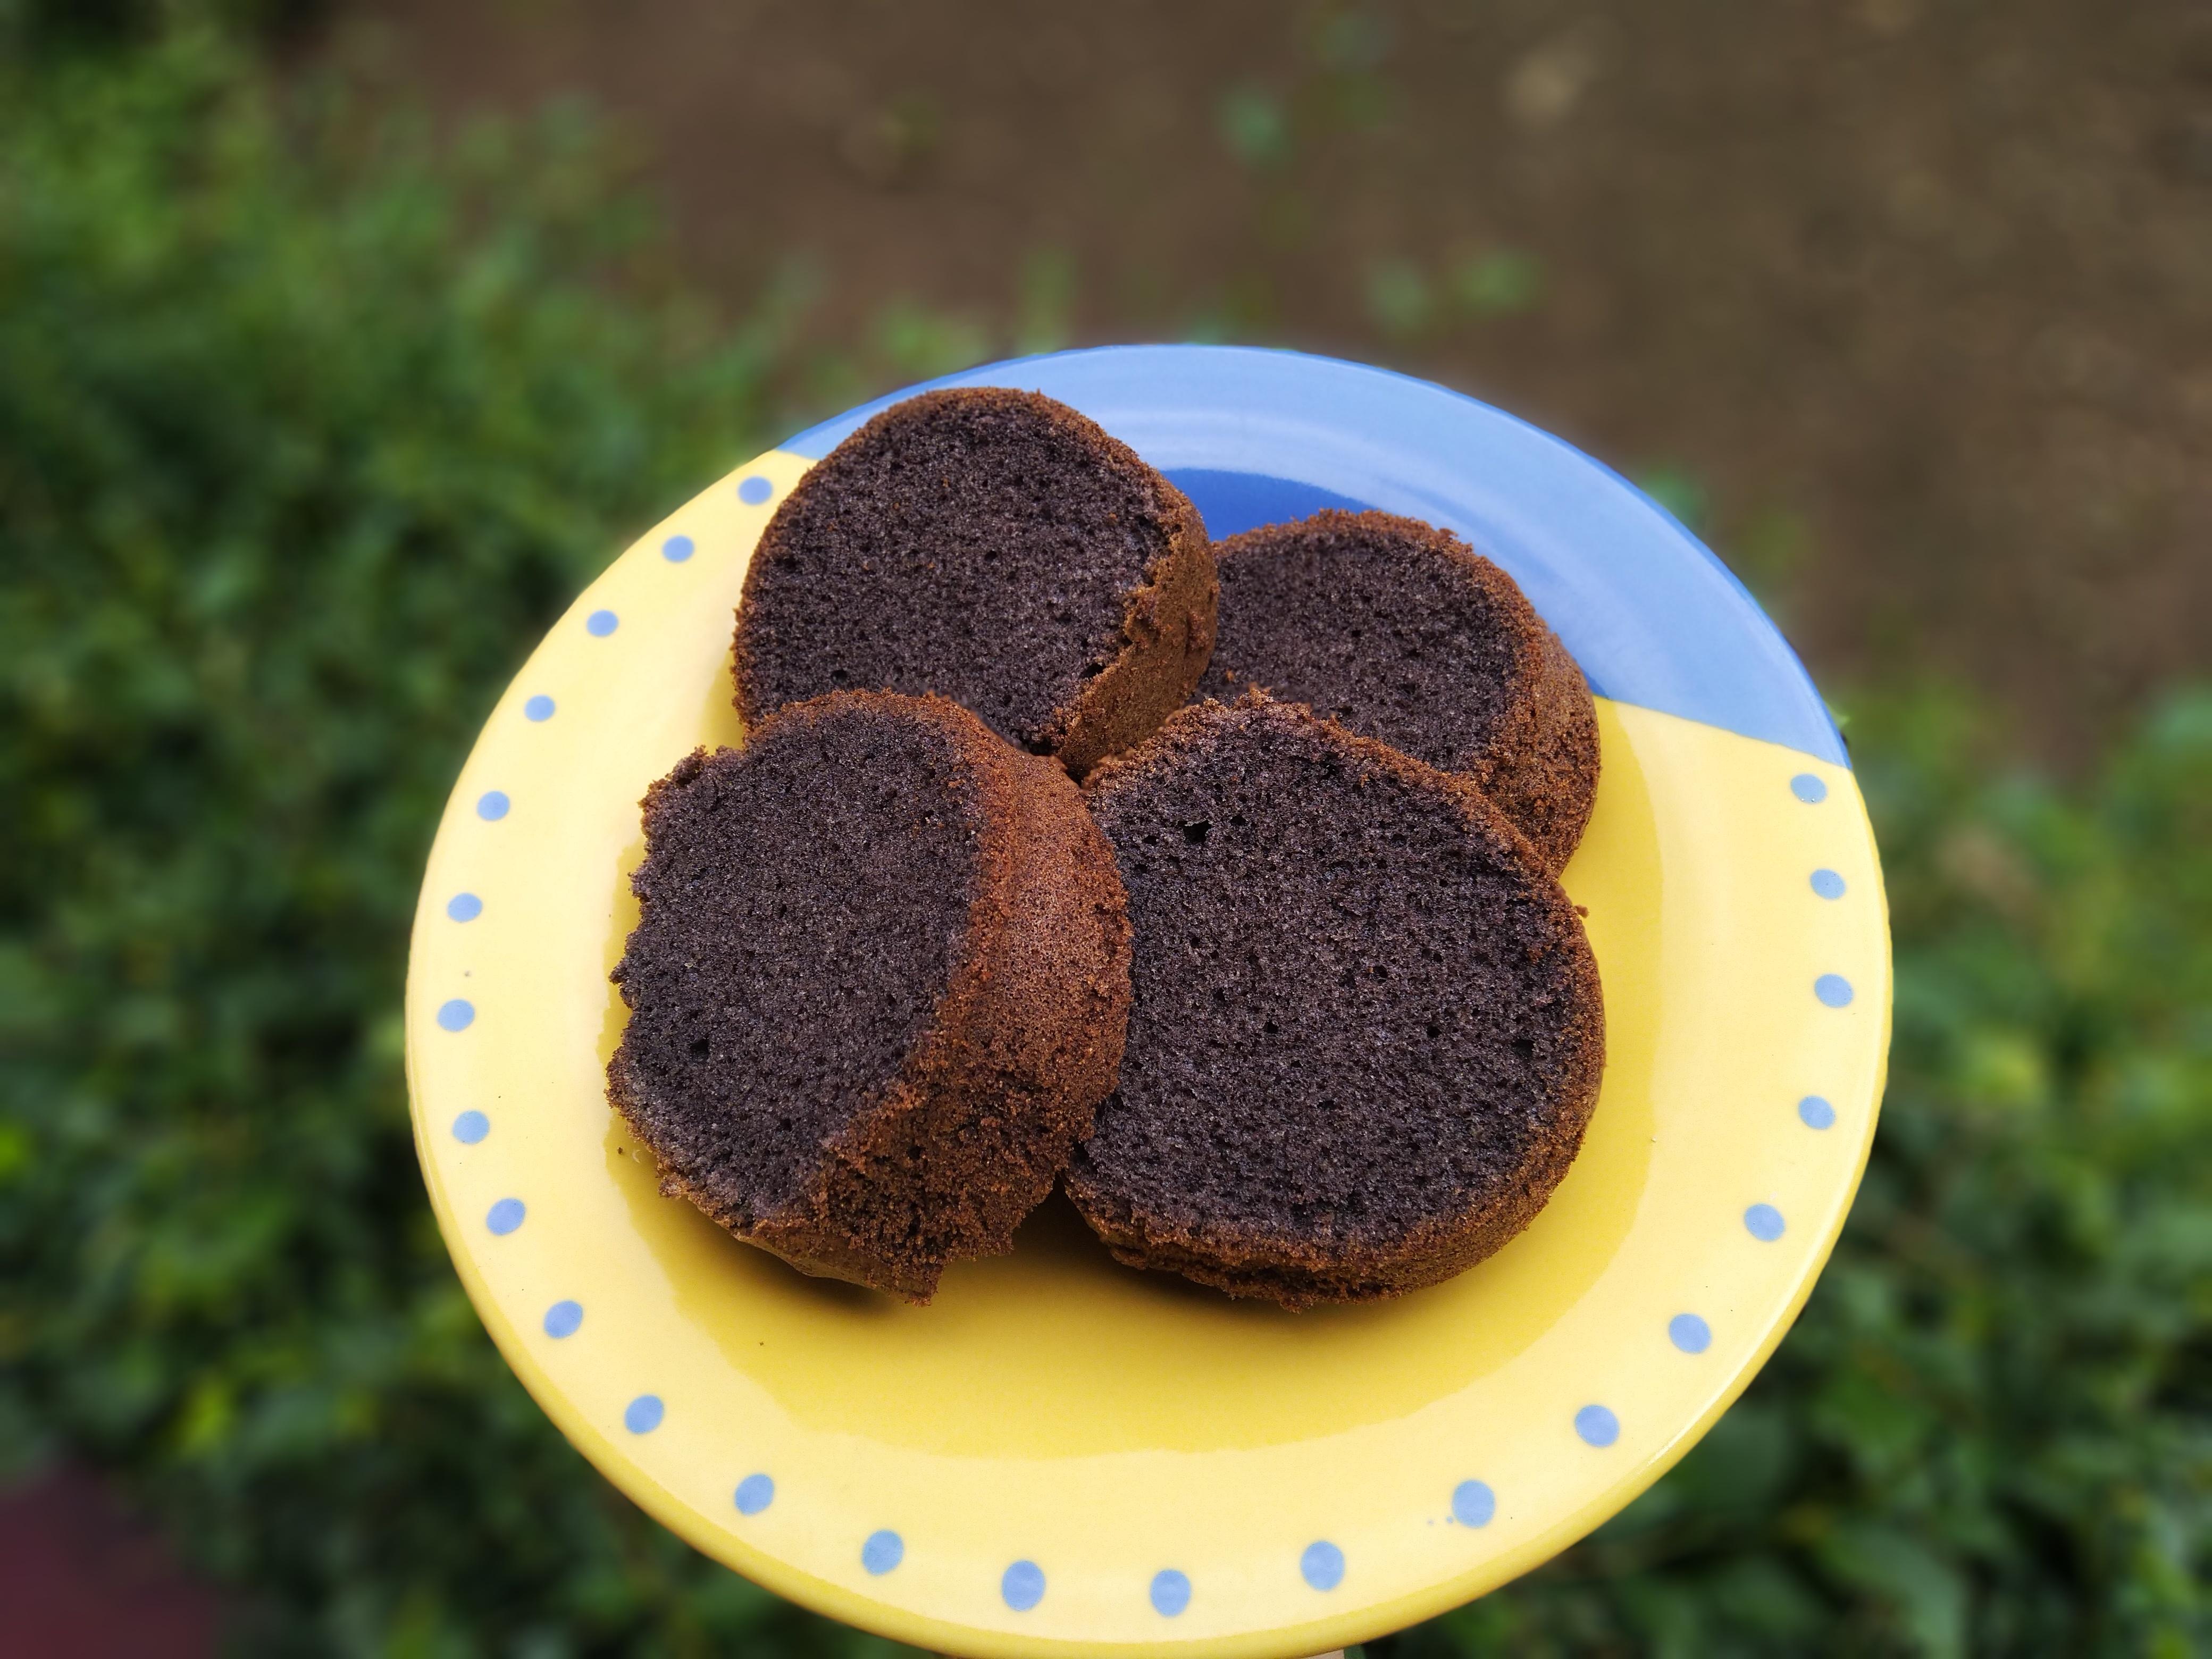 Tepung Ketan hitam untuk bolu kukus atau panggang ?